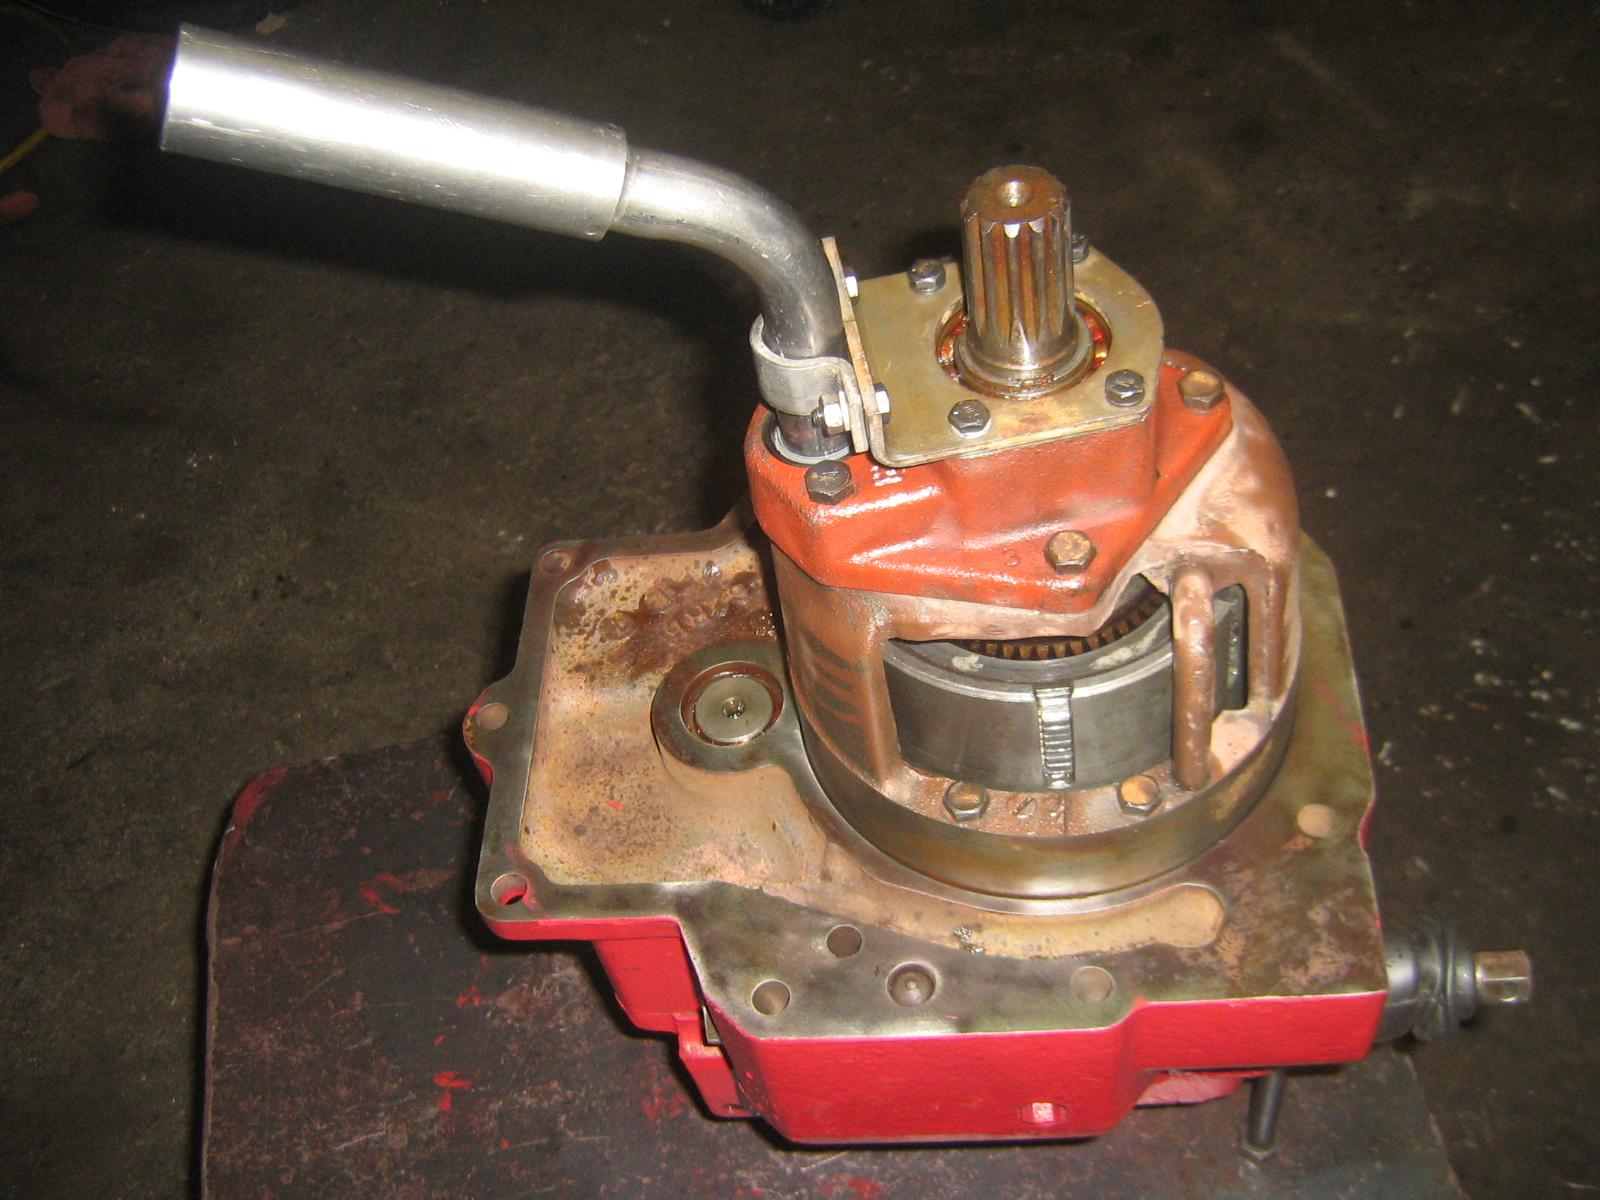 International 1466 Pto Parts Diagram Wiring Services Ih Tractor Unit Repair Information Redrunrite Rh Com Sketches Of A